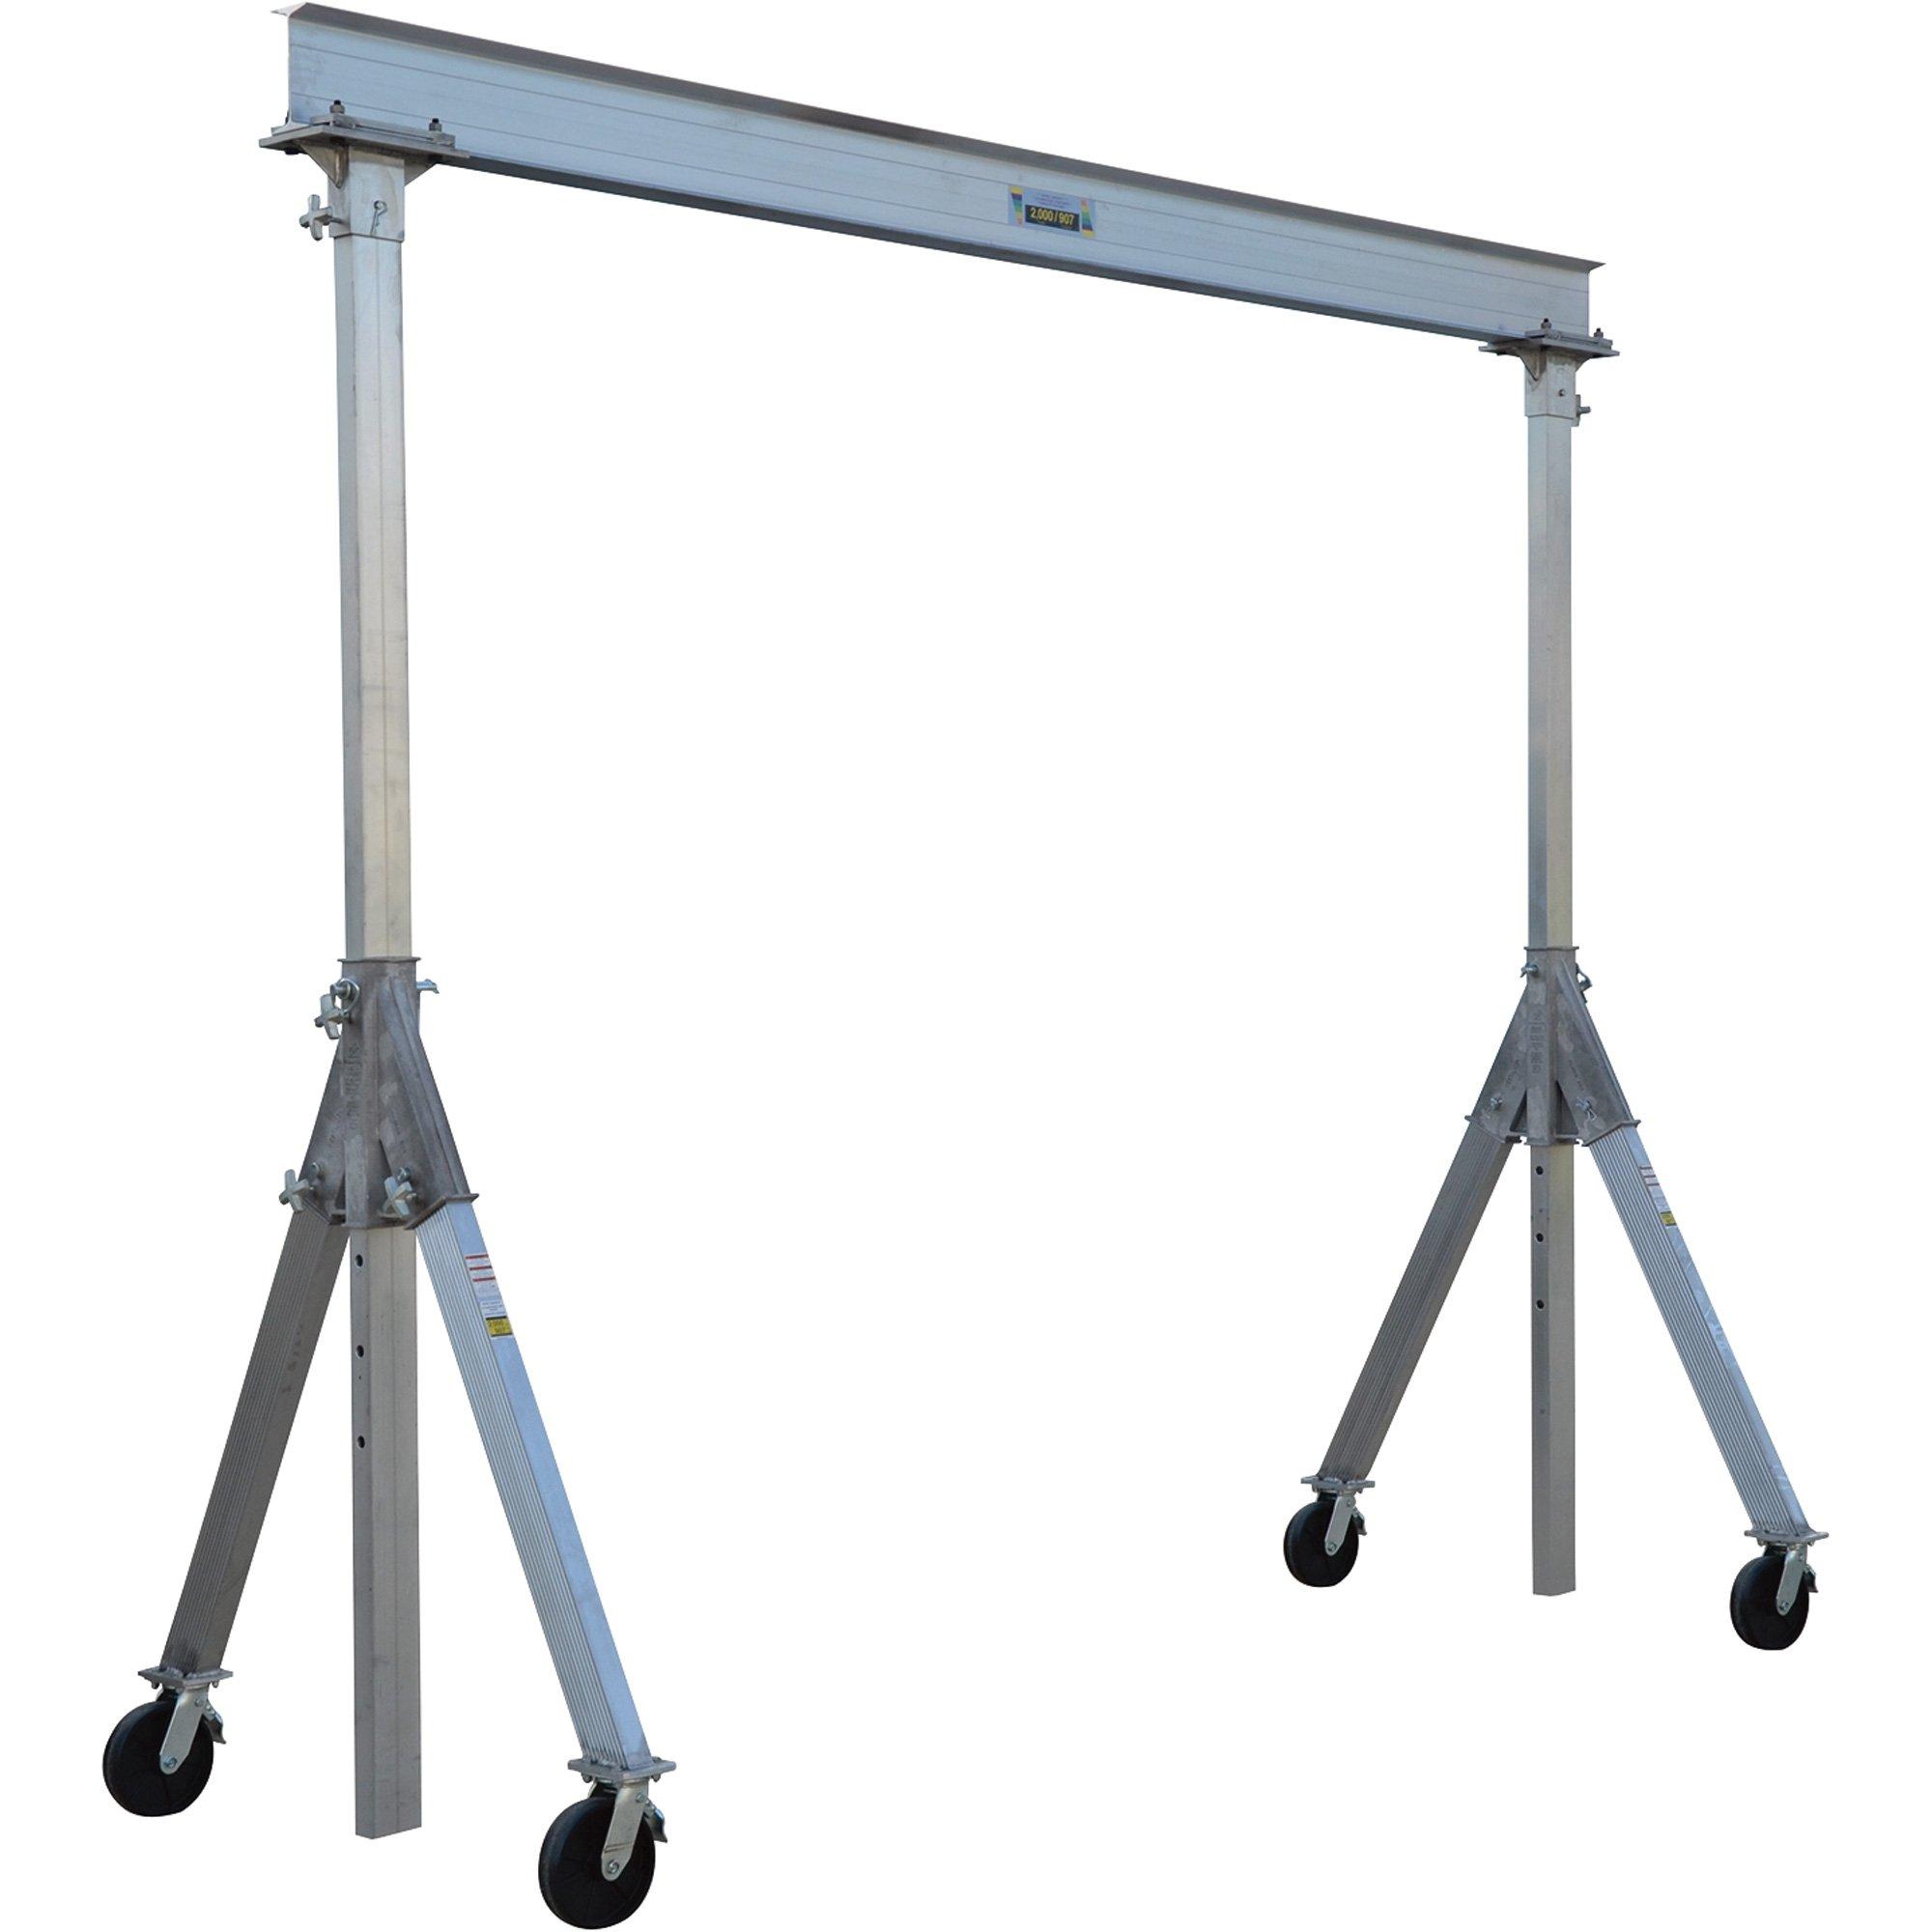 Vestil AHA-4-8-10 Aluminum Adjustable Gantry Crane, 4000 lb. Capacity, 8' Overall Beam, 96'' Usable Trolley Travel Distance, Under I-Beam Range 92''-120'', 130-1/8'' Height by Vestil (Image #1)